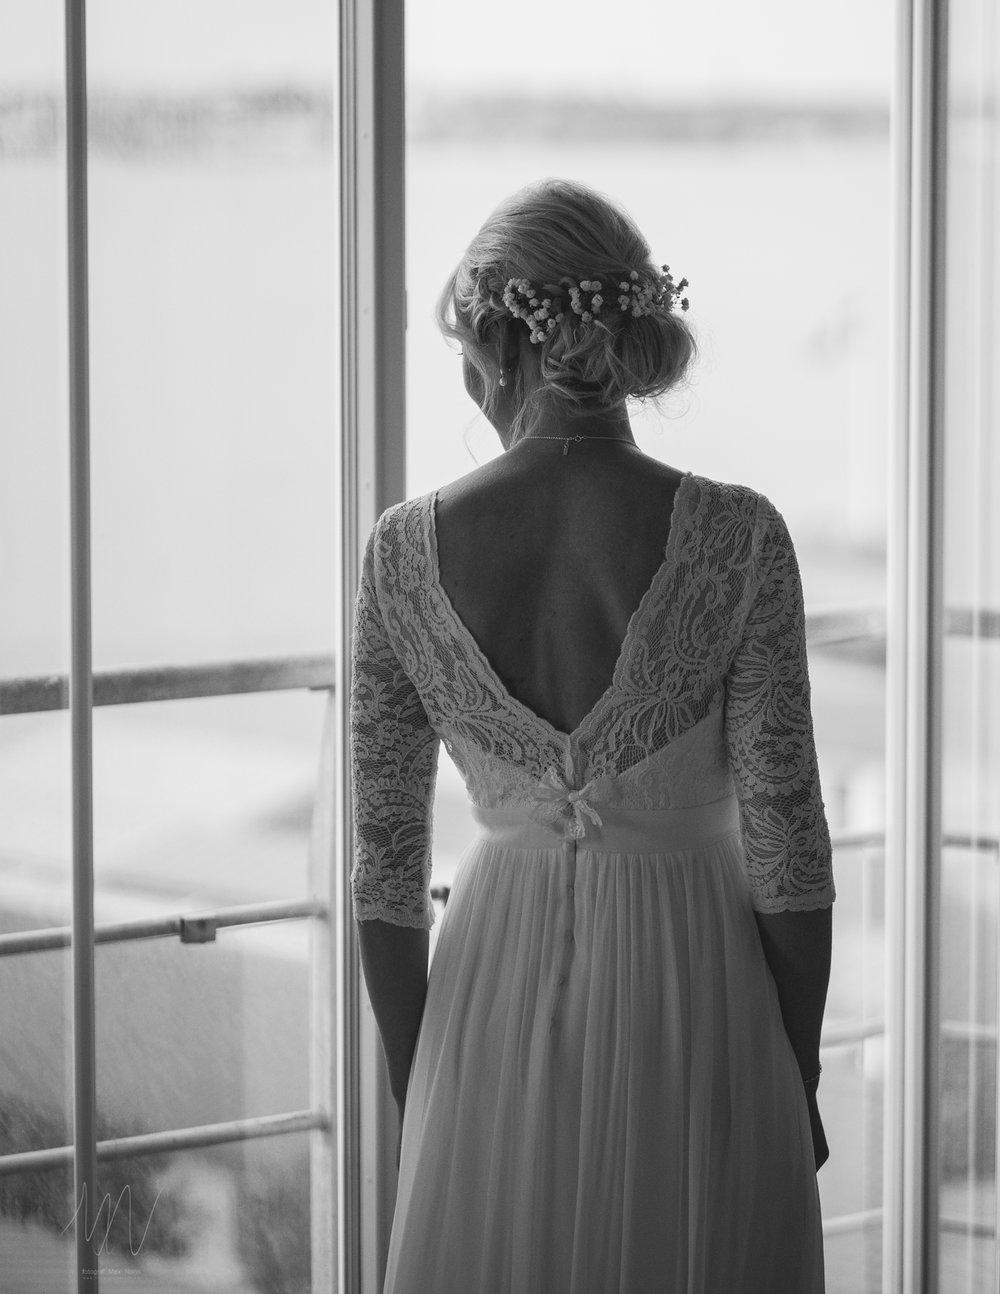 Bröllop-fotografmaxnorin.se-MariaMarcus-7.JPG